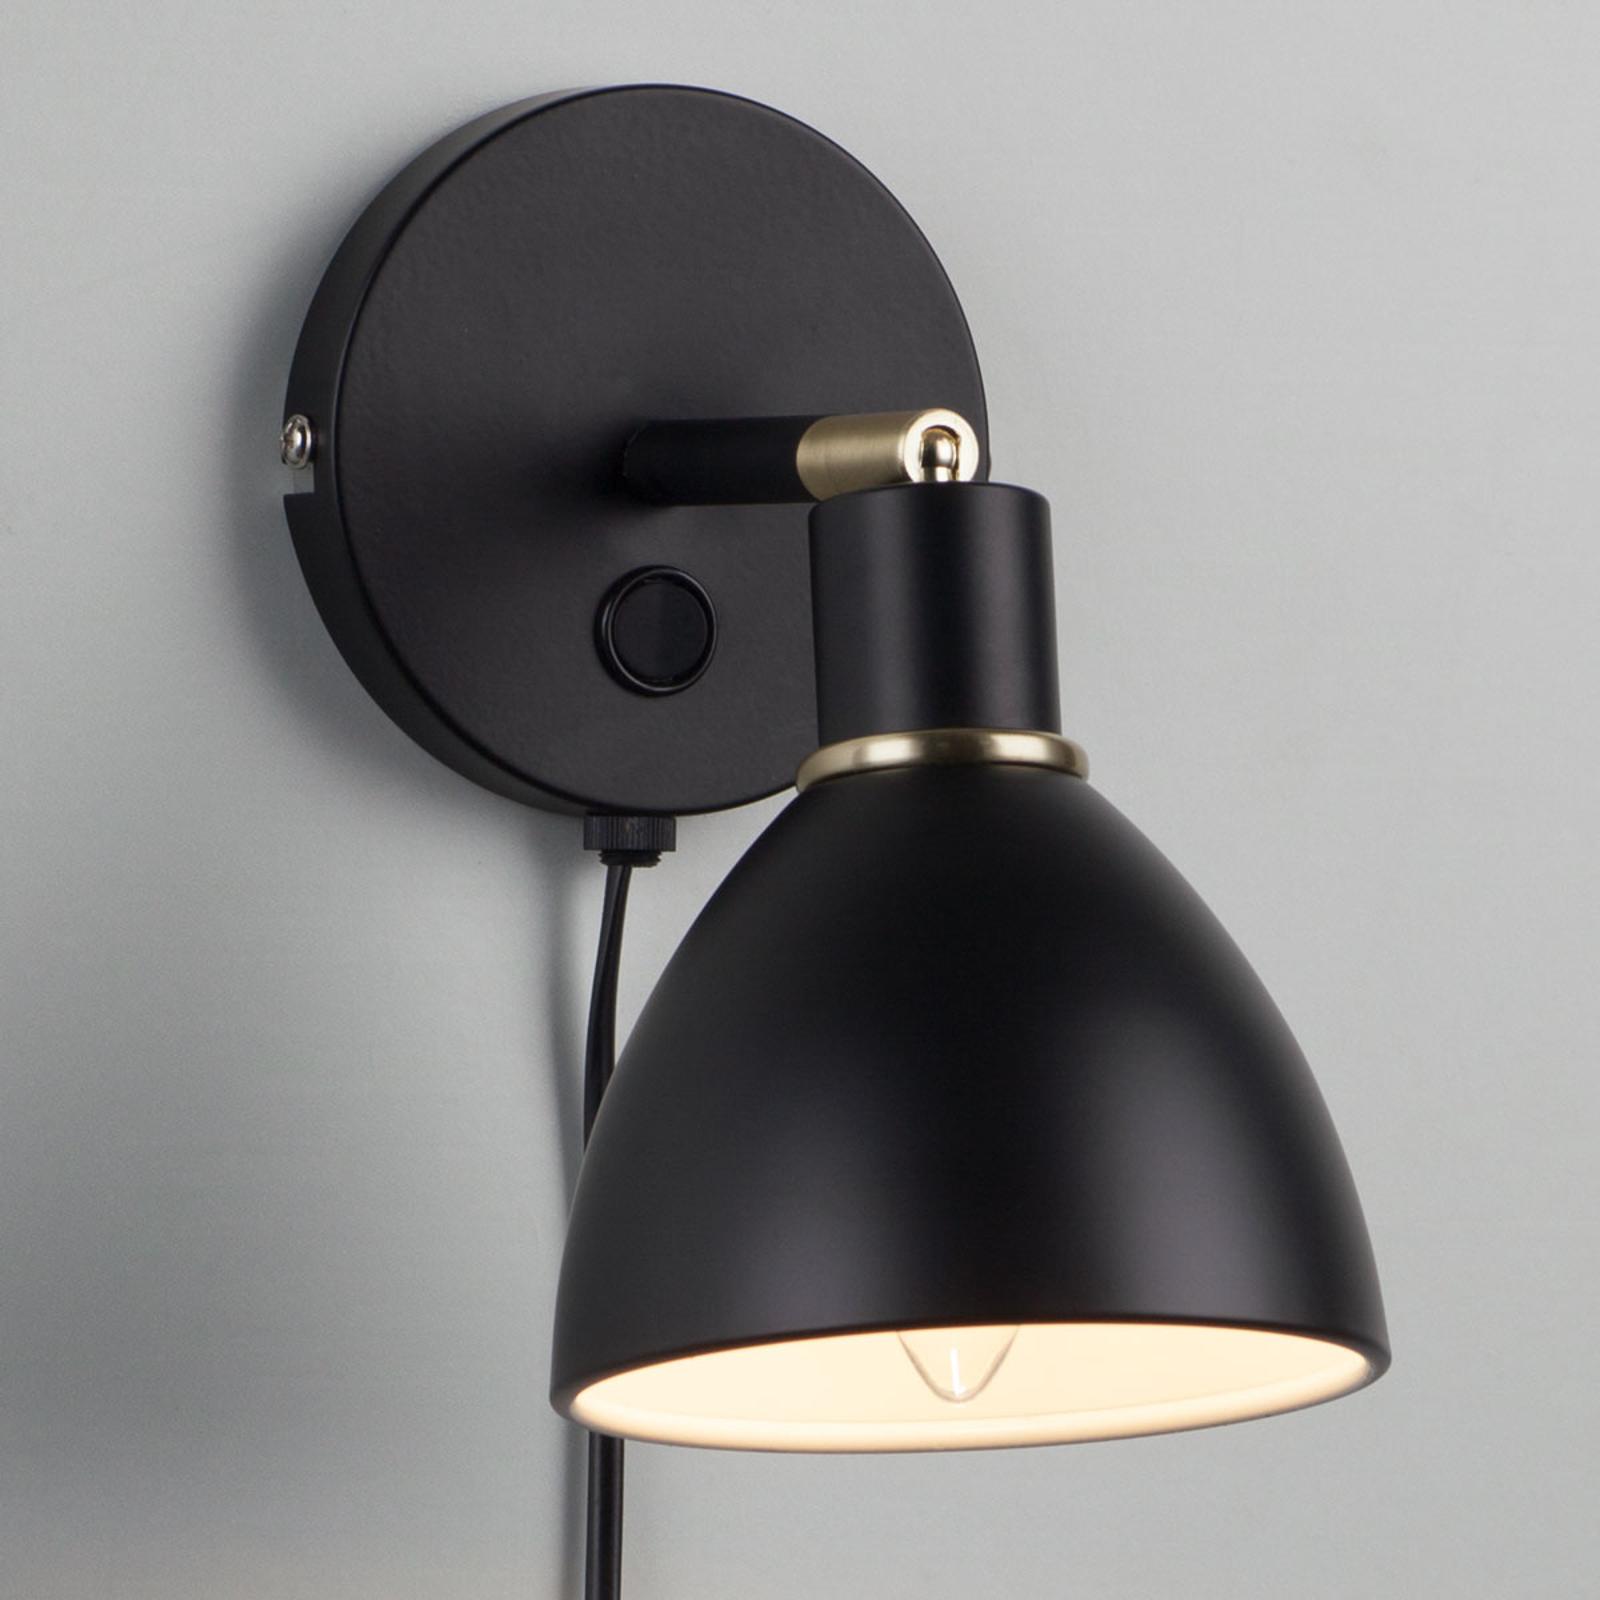 Sort væglampe Ray med svingbar skærm